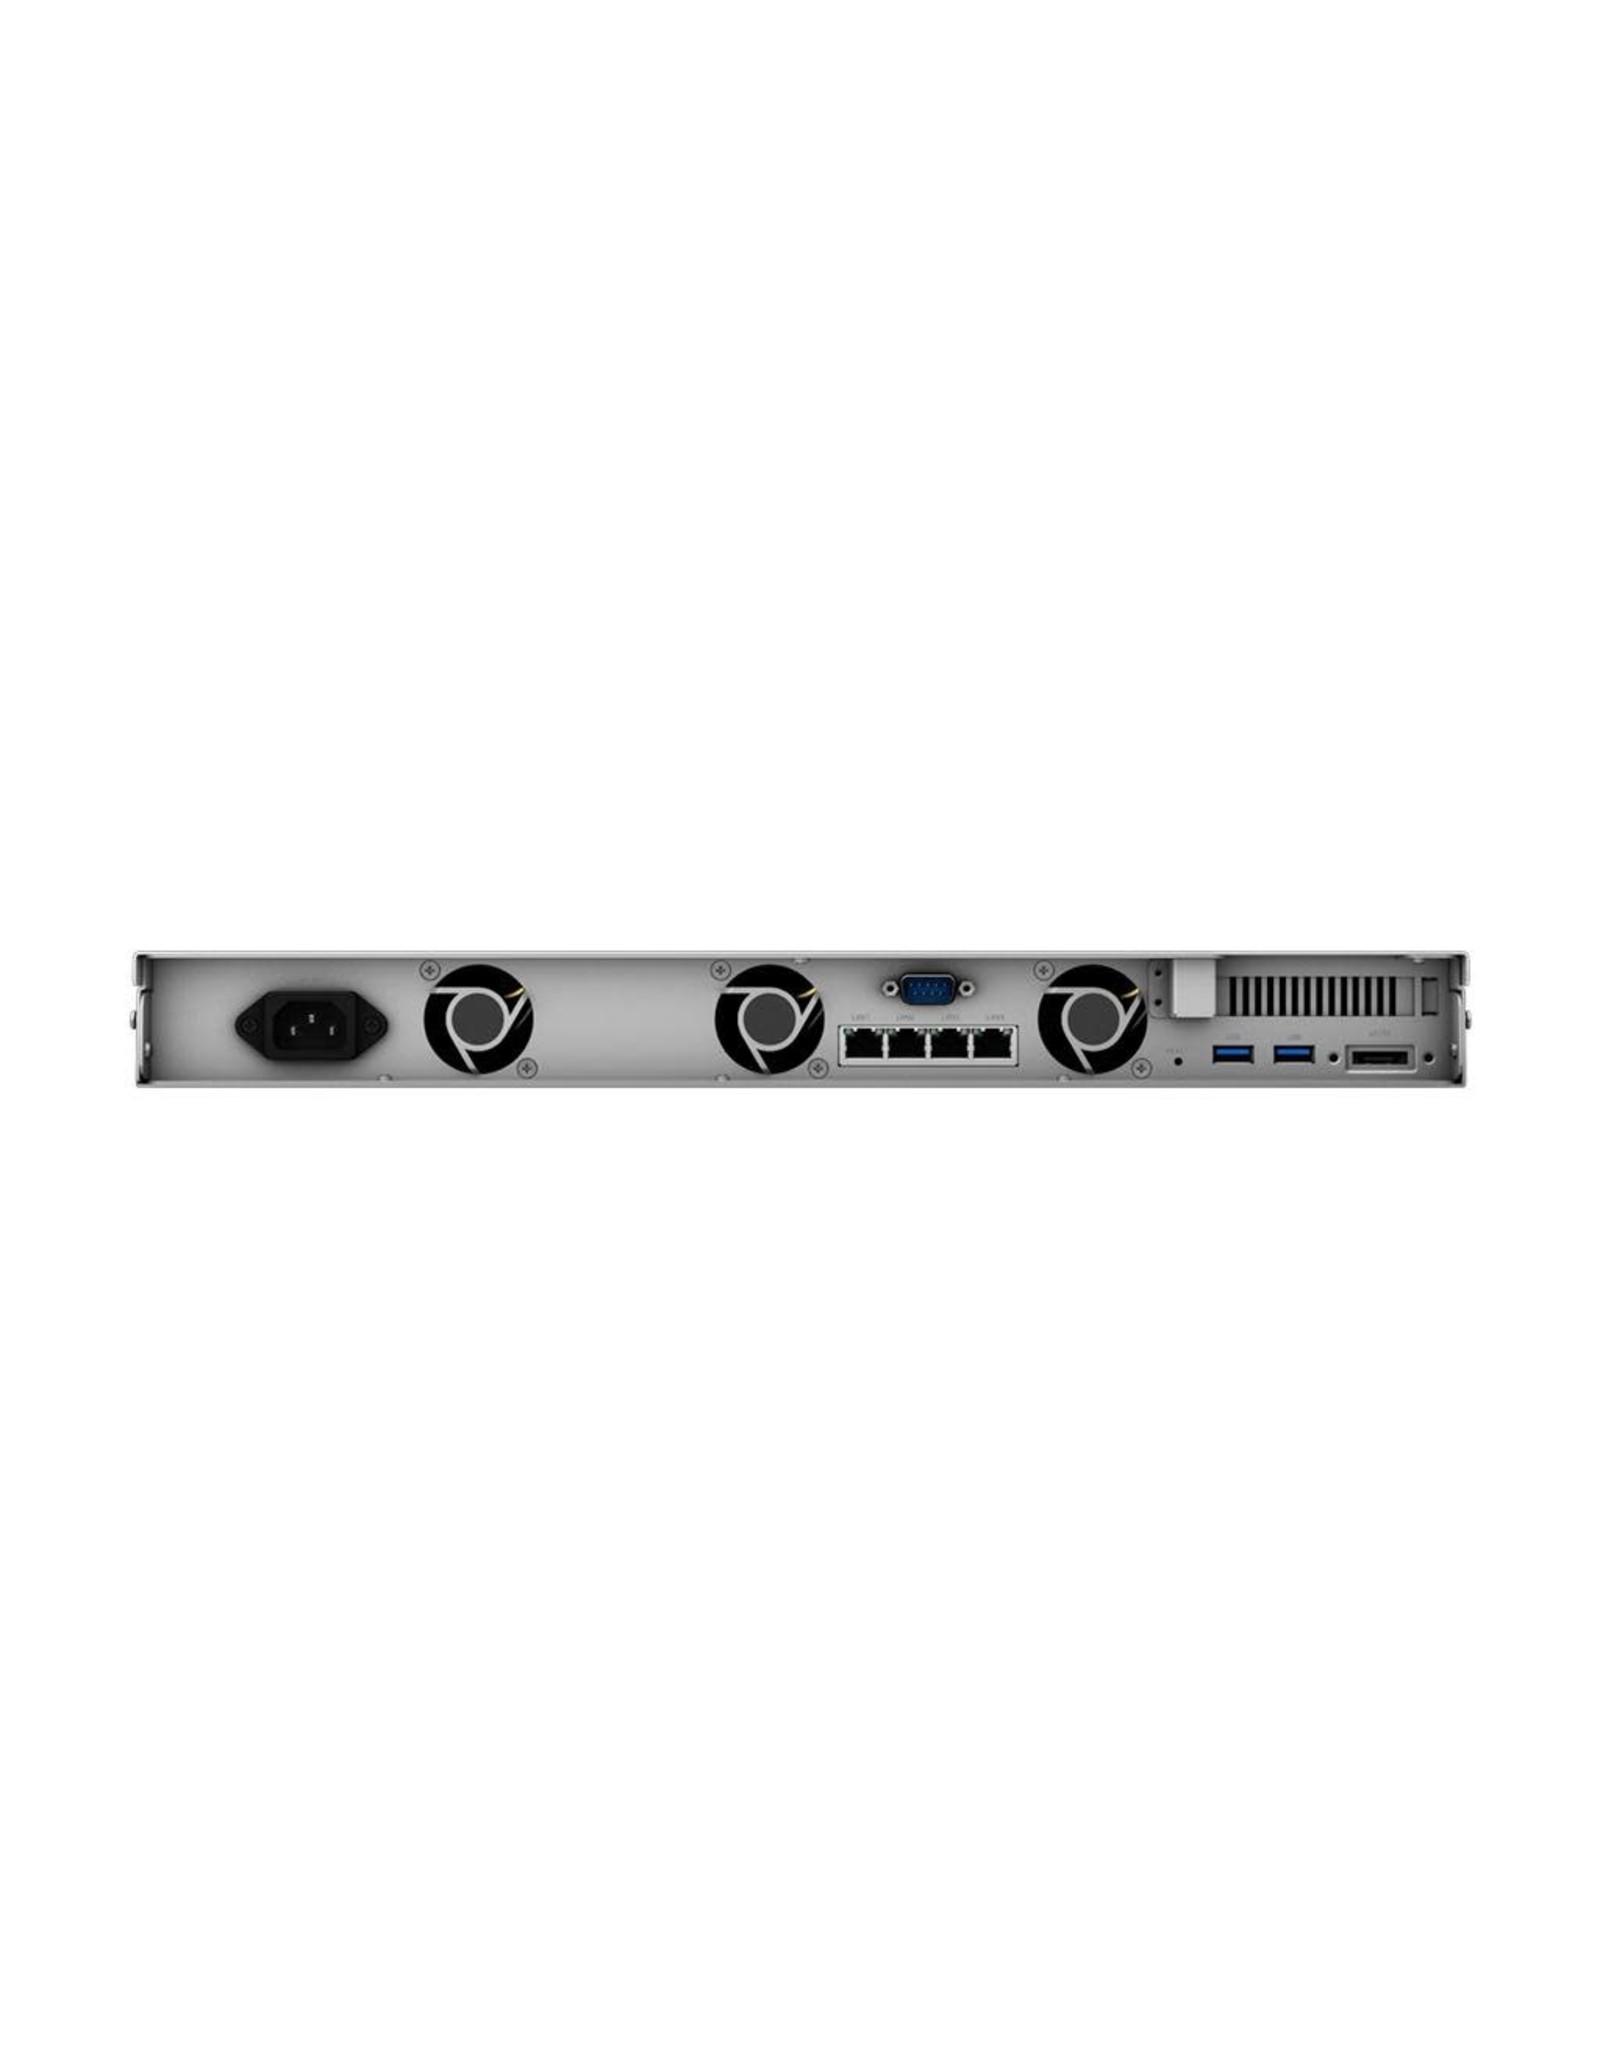 Synology Synology RS818+ 48TB 4-Bay 1RU High Performance 2.4GHz Quadcore NAS Server (4x12TB Value Enterprise HDD 5YR)